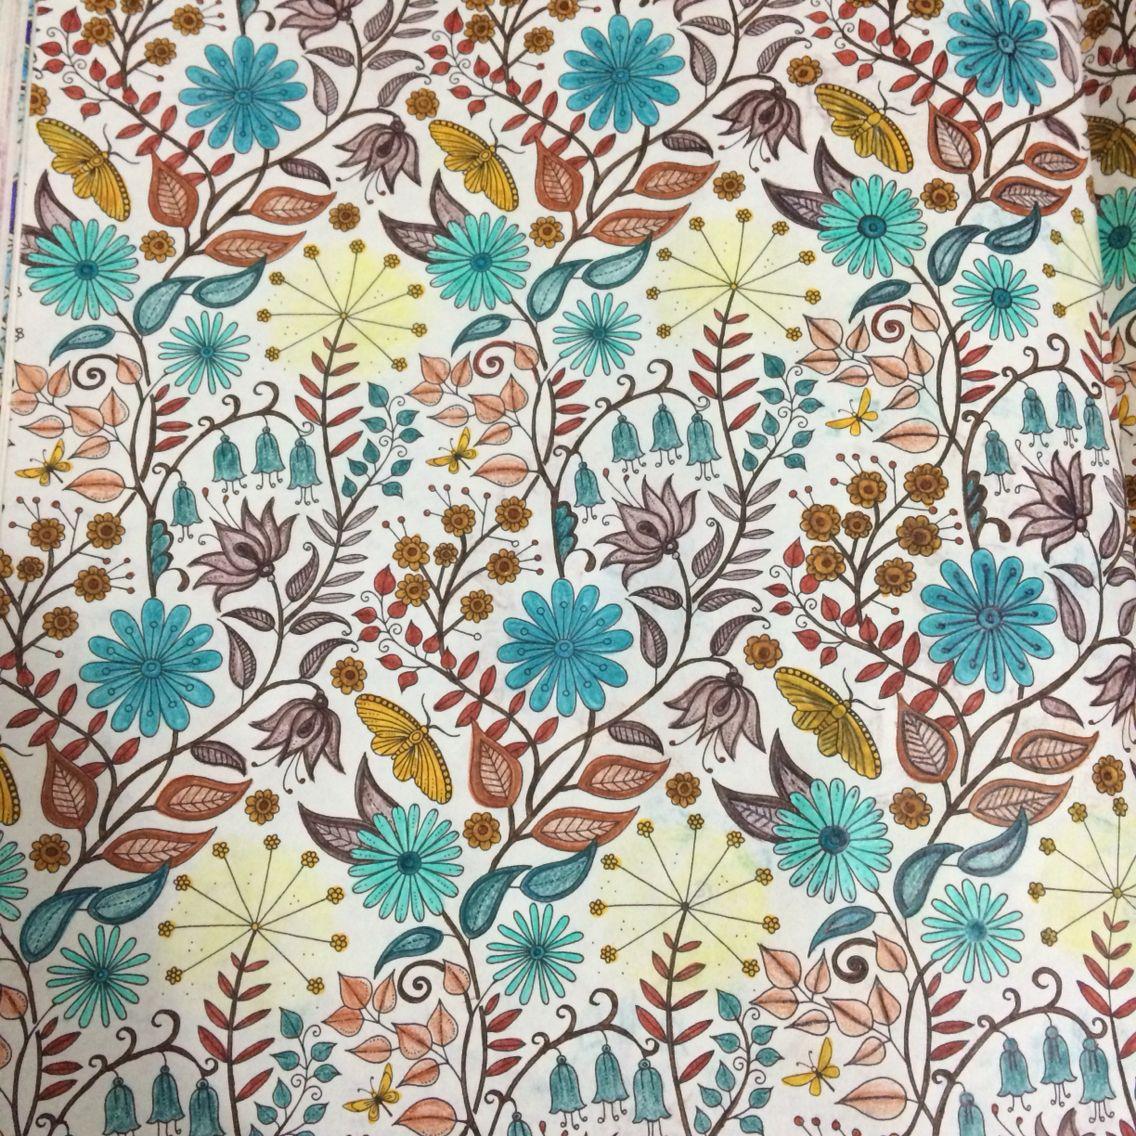 Johanna basford jardim secreto mandalas pinterest for El jardin secreto johanna basford